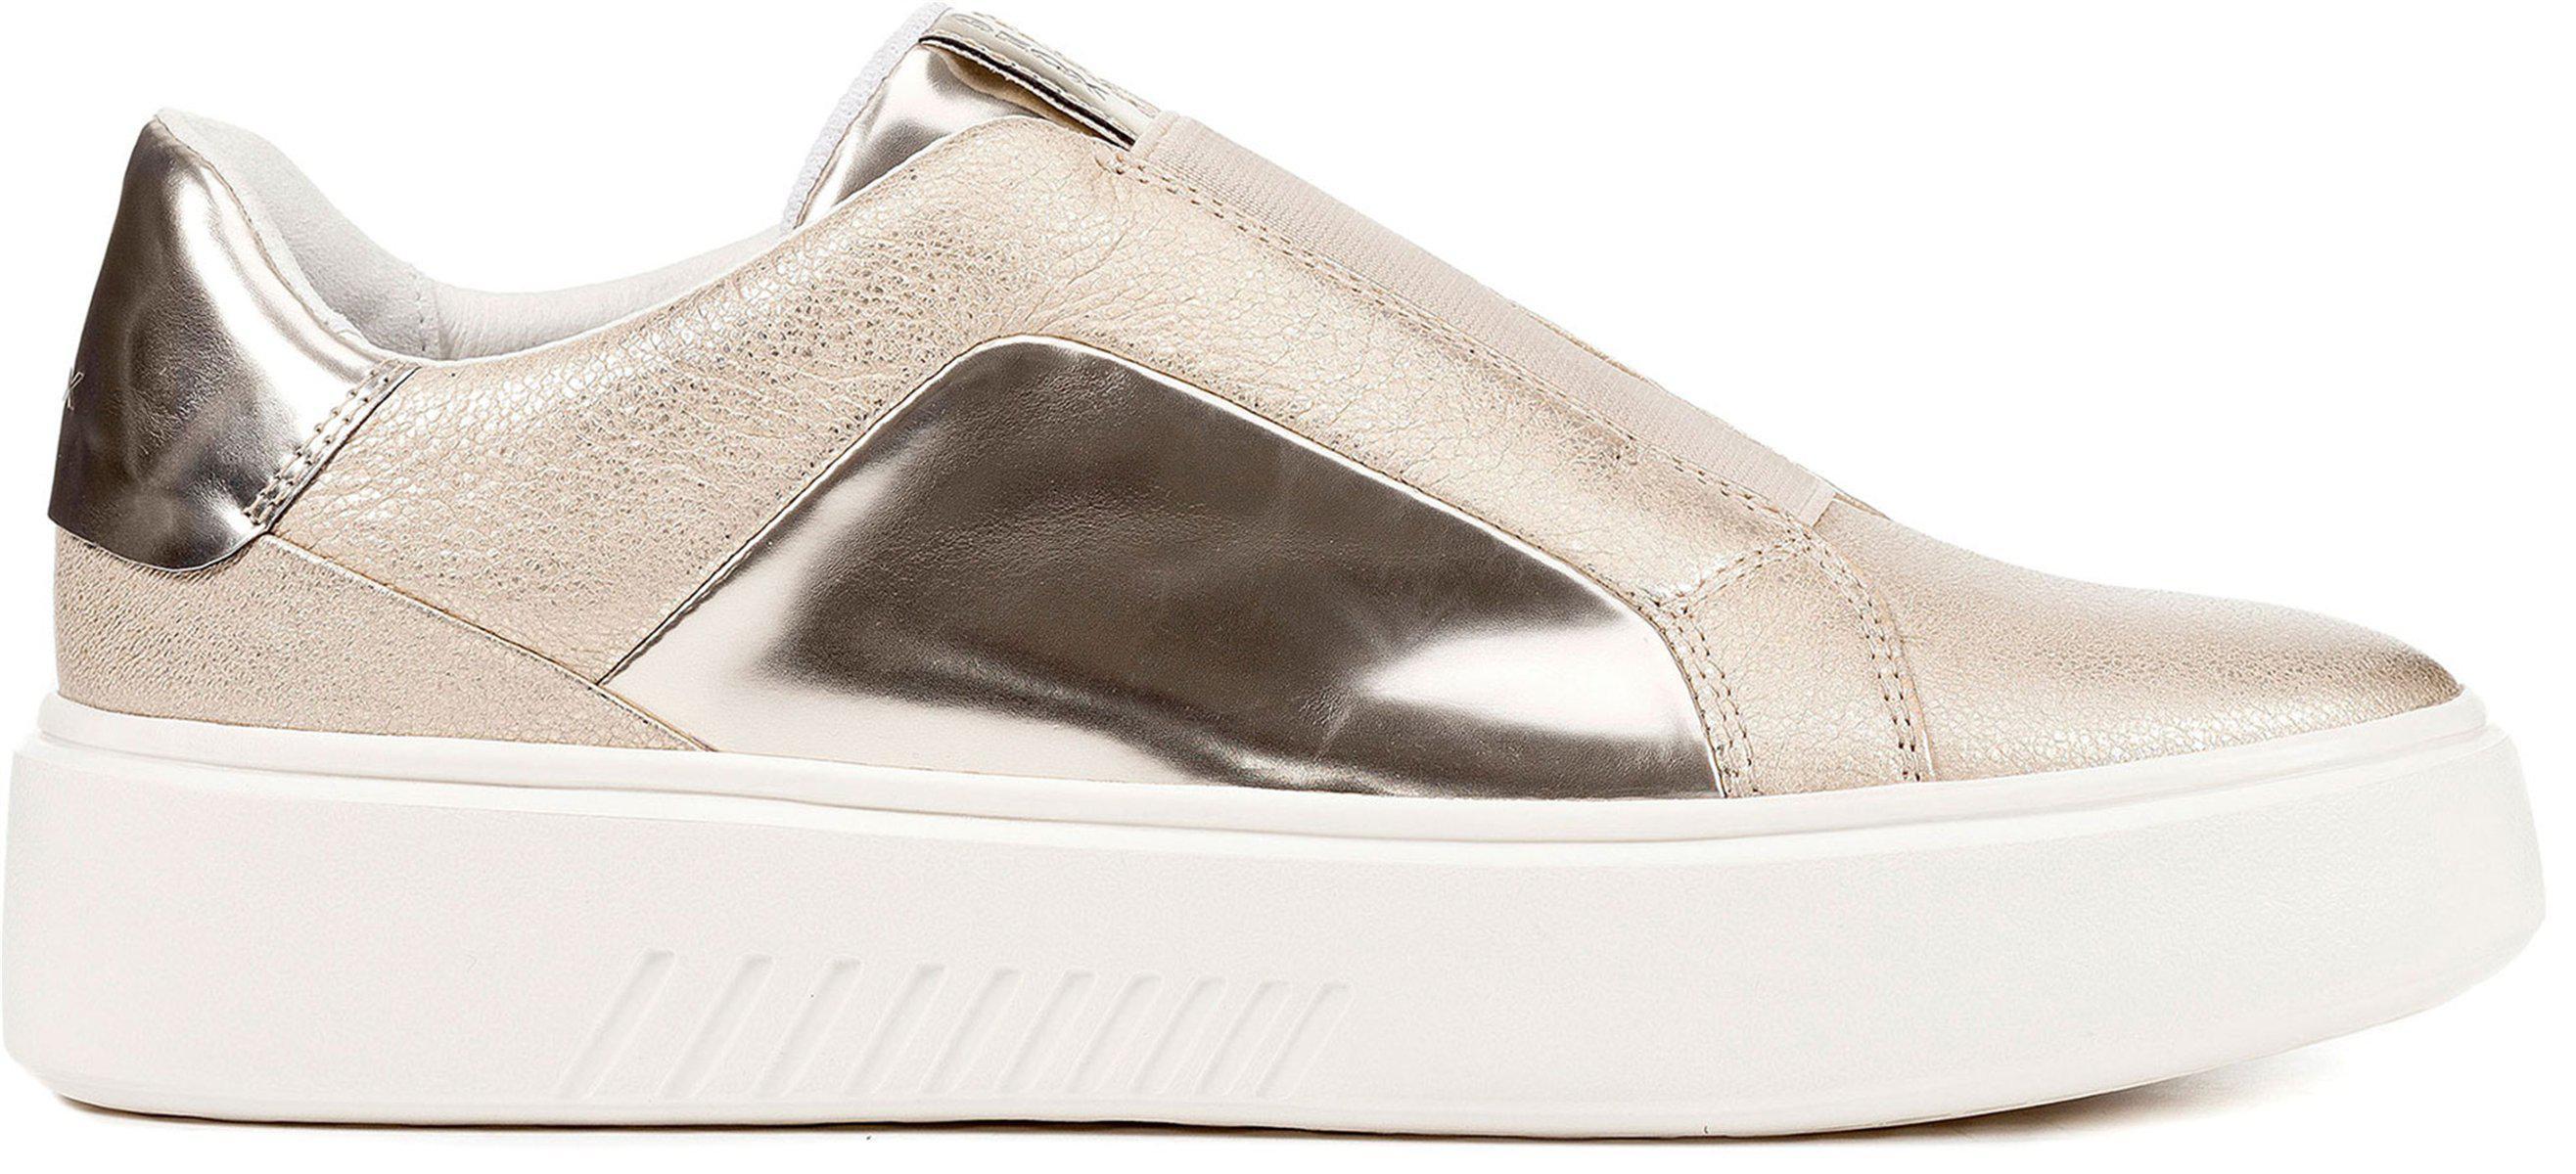 Nhenbus sneakers - Grey Geox Limited 1SXIbOmzA